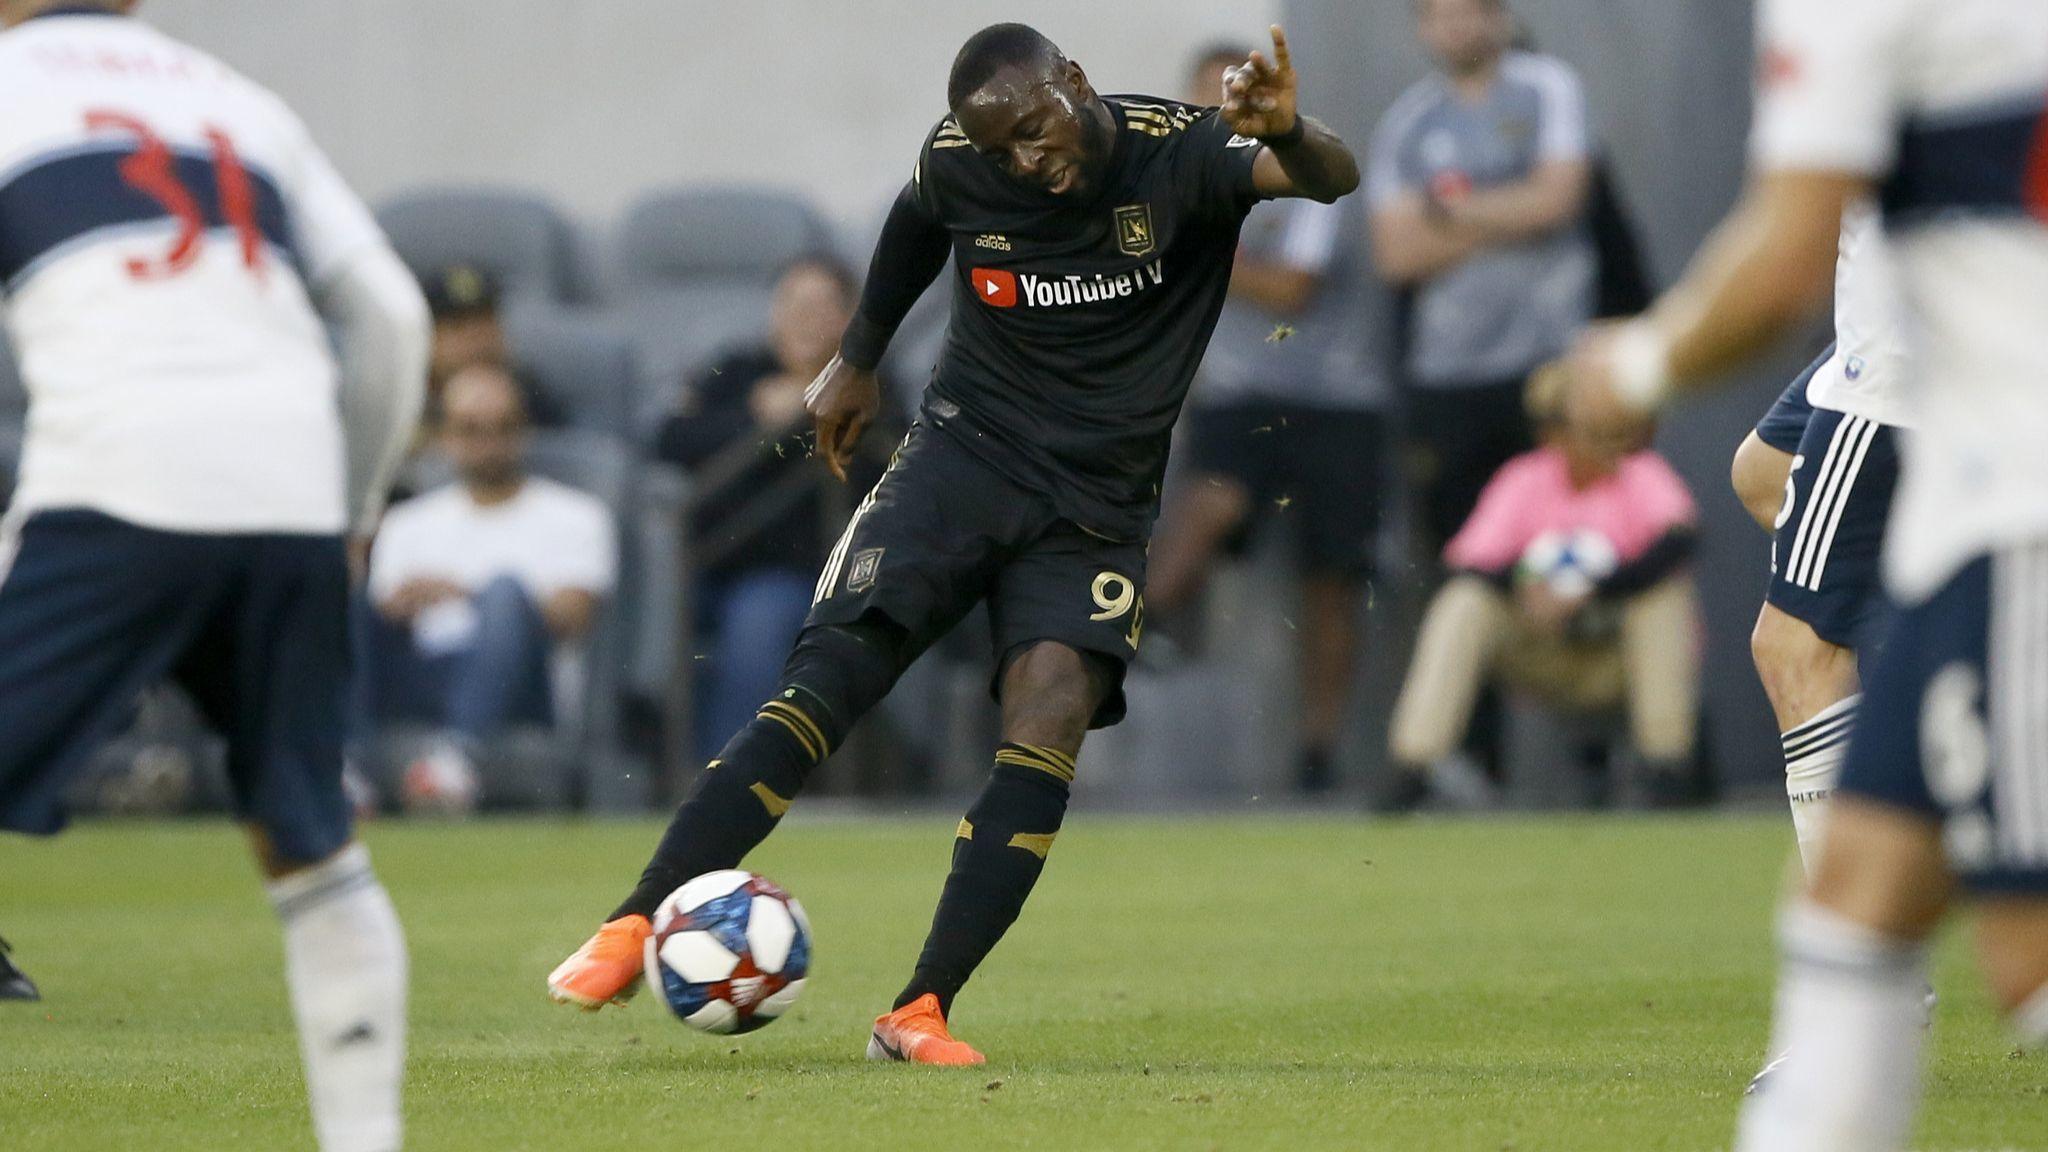 Adama Diomande scores twice as LAFC hands Dynamo first home loss